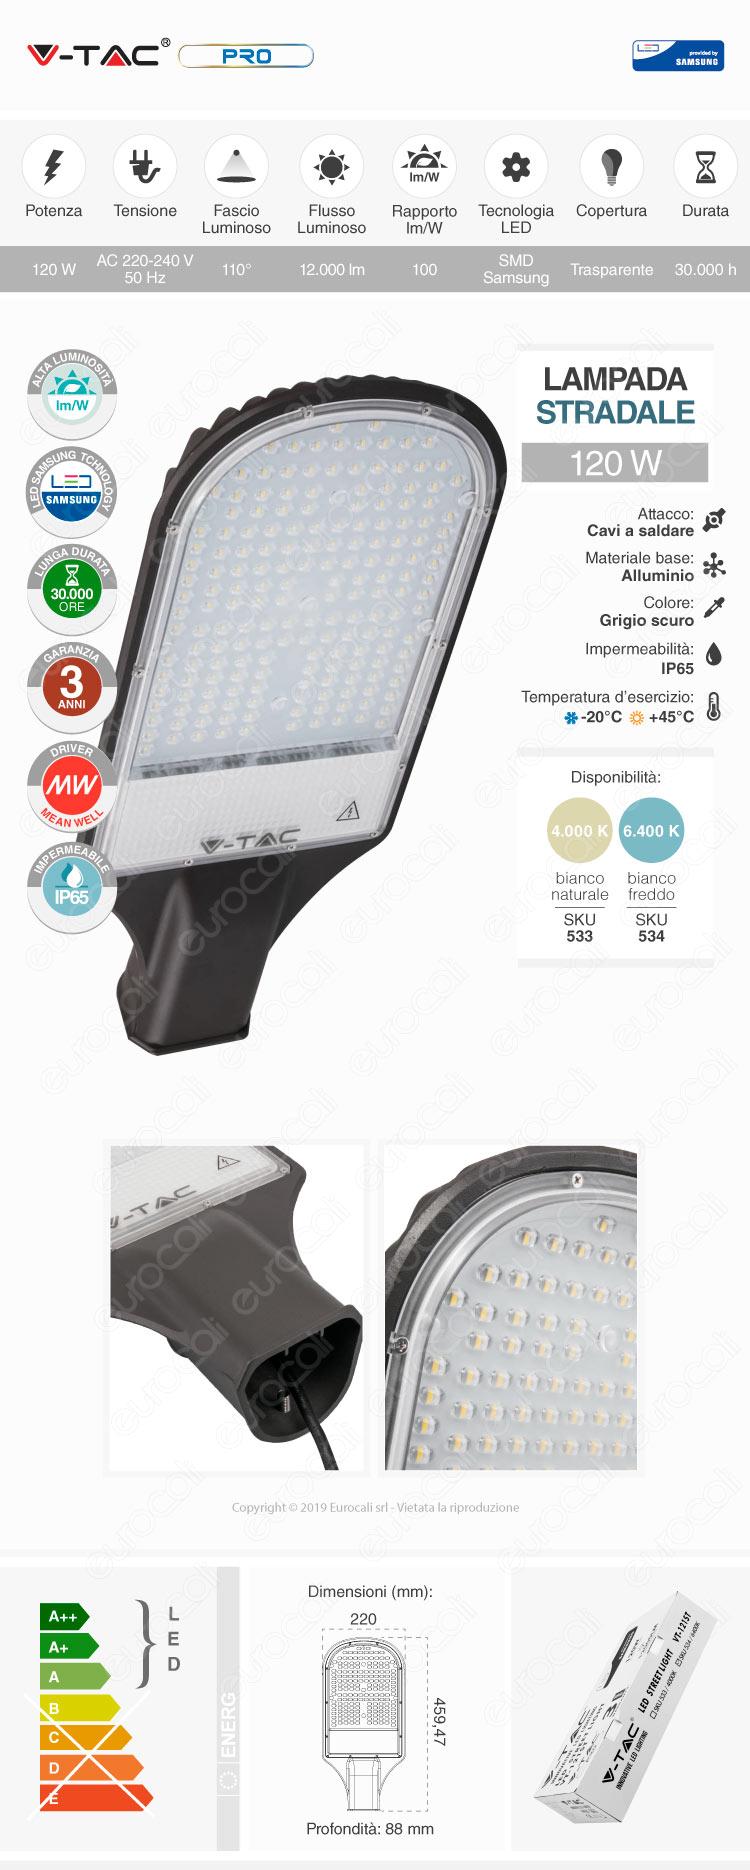 V-Tac PRO VT-121ST Lampada Stradale LED 120W Lampione SMD Chip Samsung